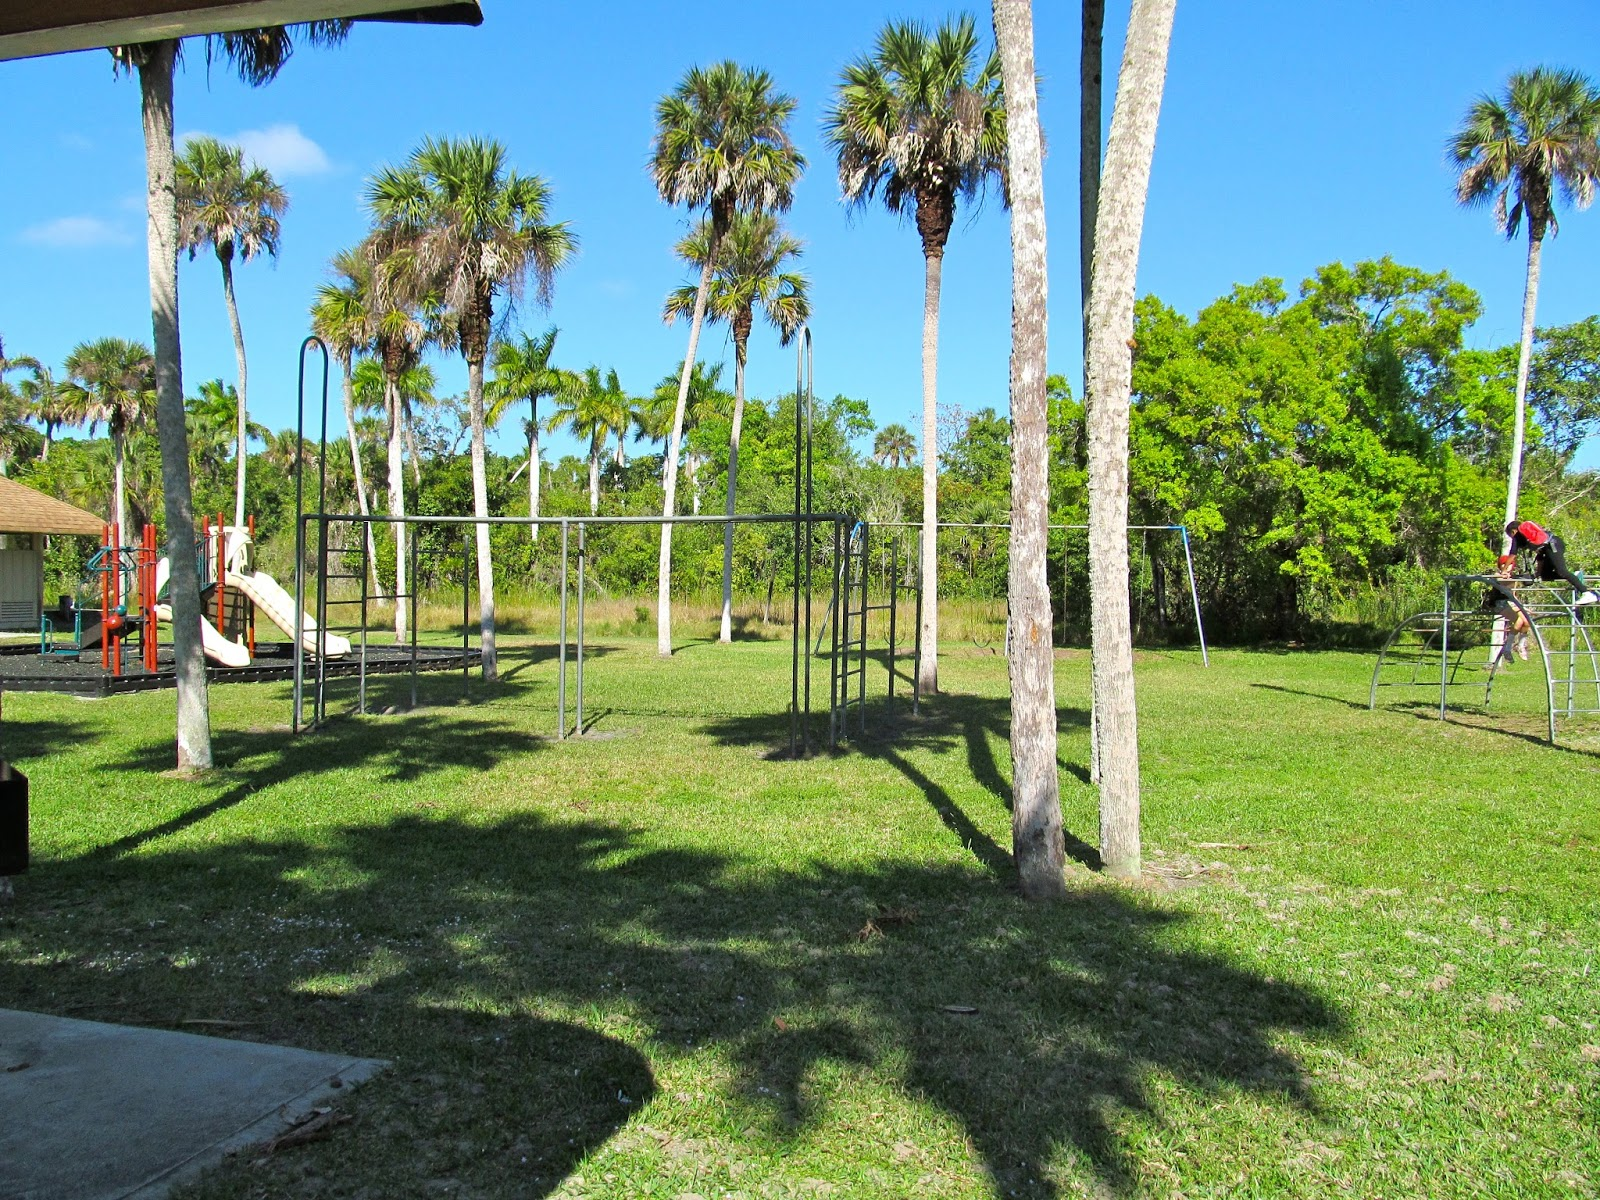 Playground at Collier-Seminole State Park - Naples, FL